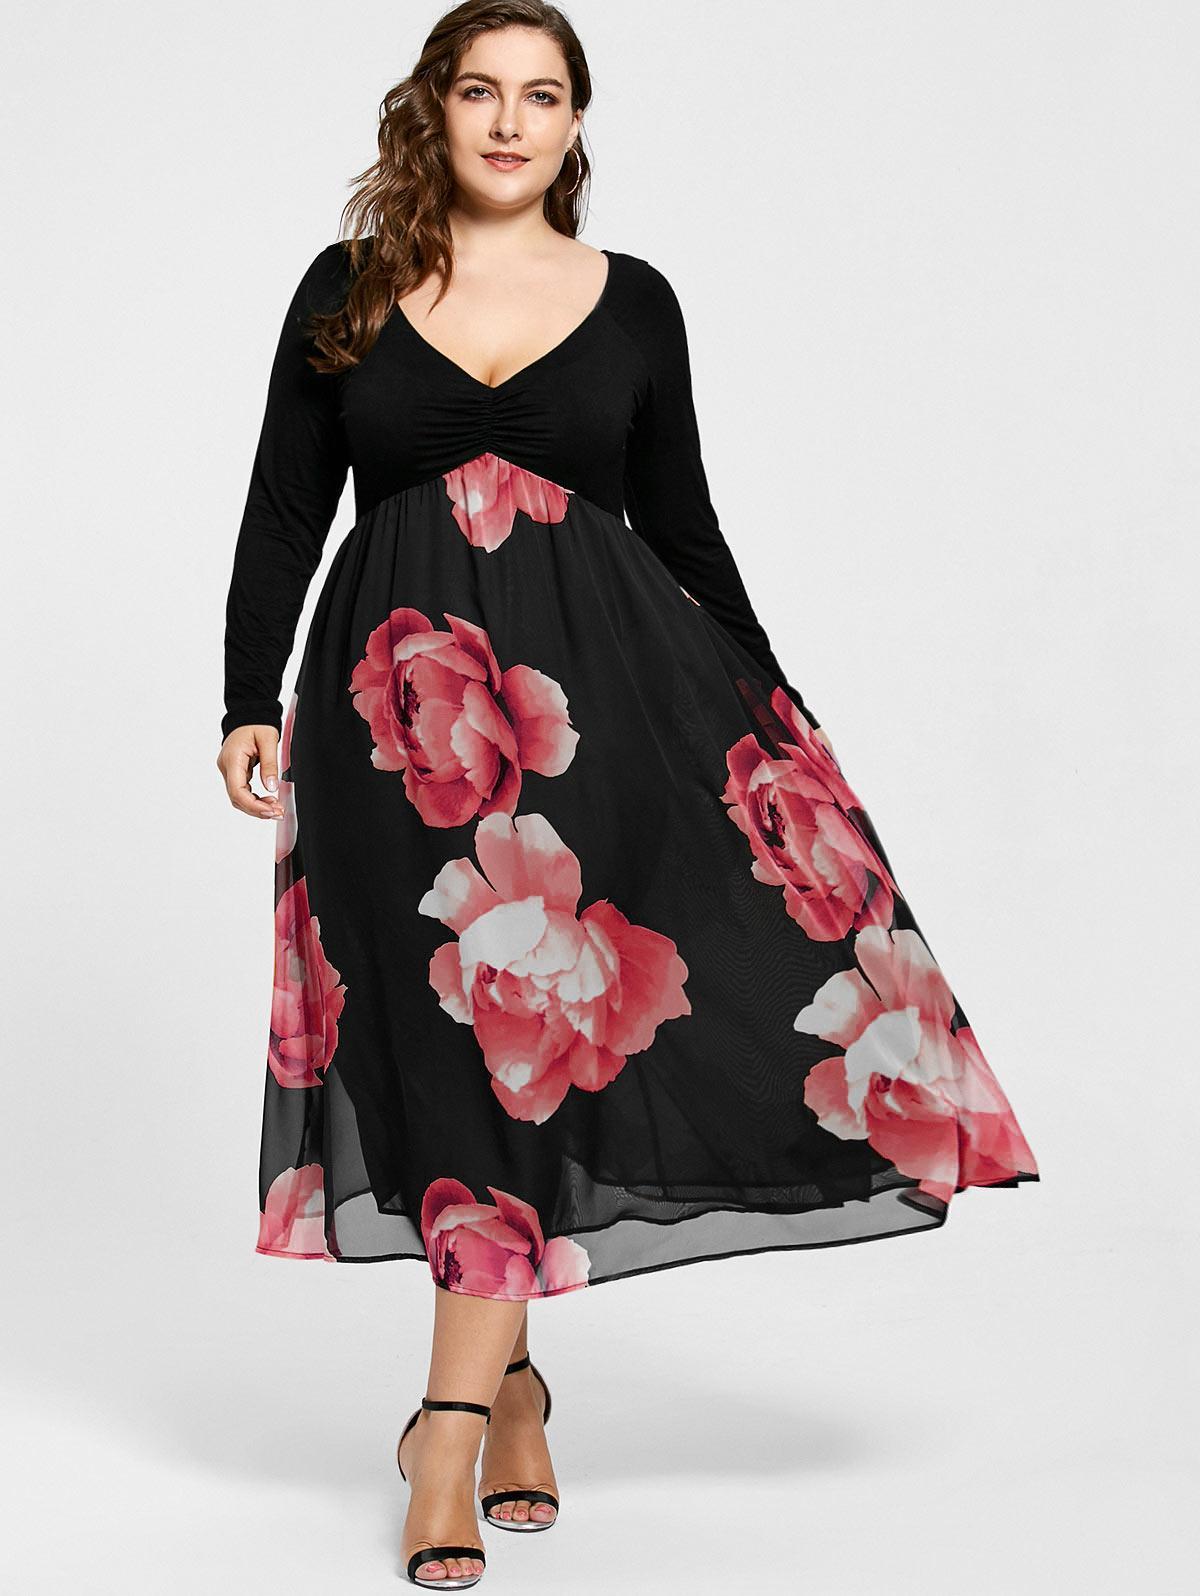 Gamiss 2018 New Fashion Plus Size Floral Print Empire Waist Midi Dress  Women Vintage V Neck Long Sleeve Lady Large Dress 5XL UK 2019 From  Duixinju 02823812a210